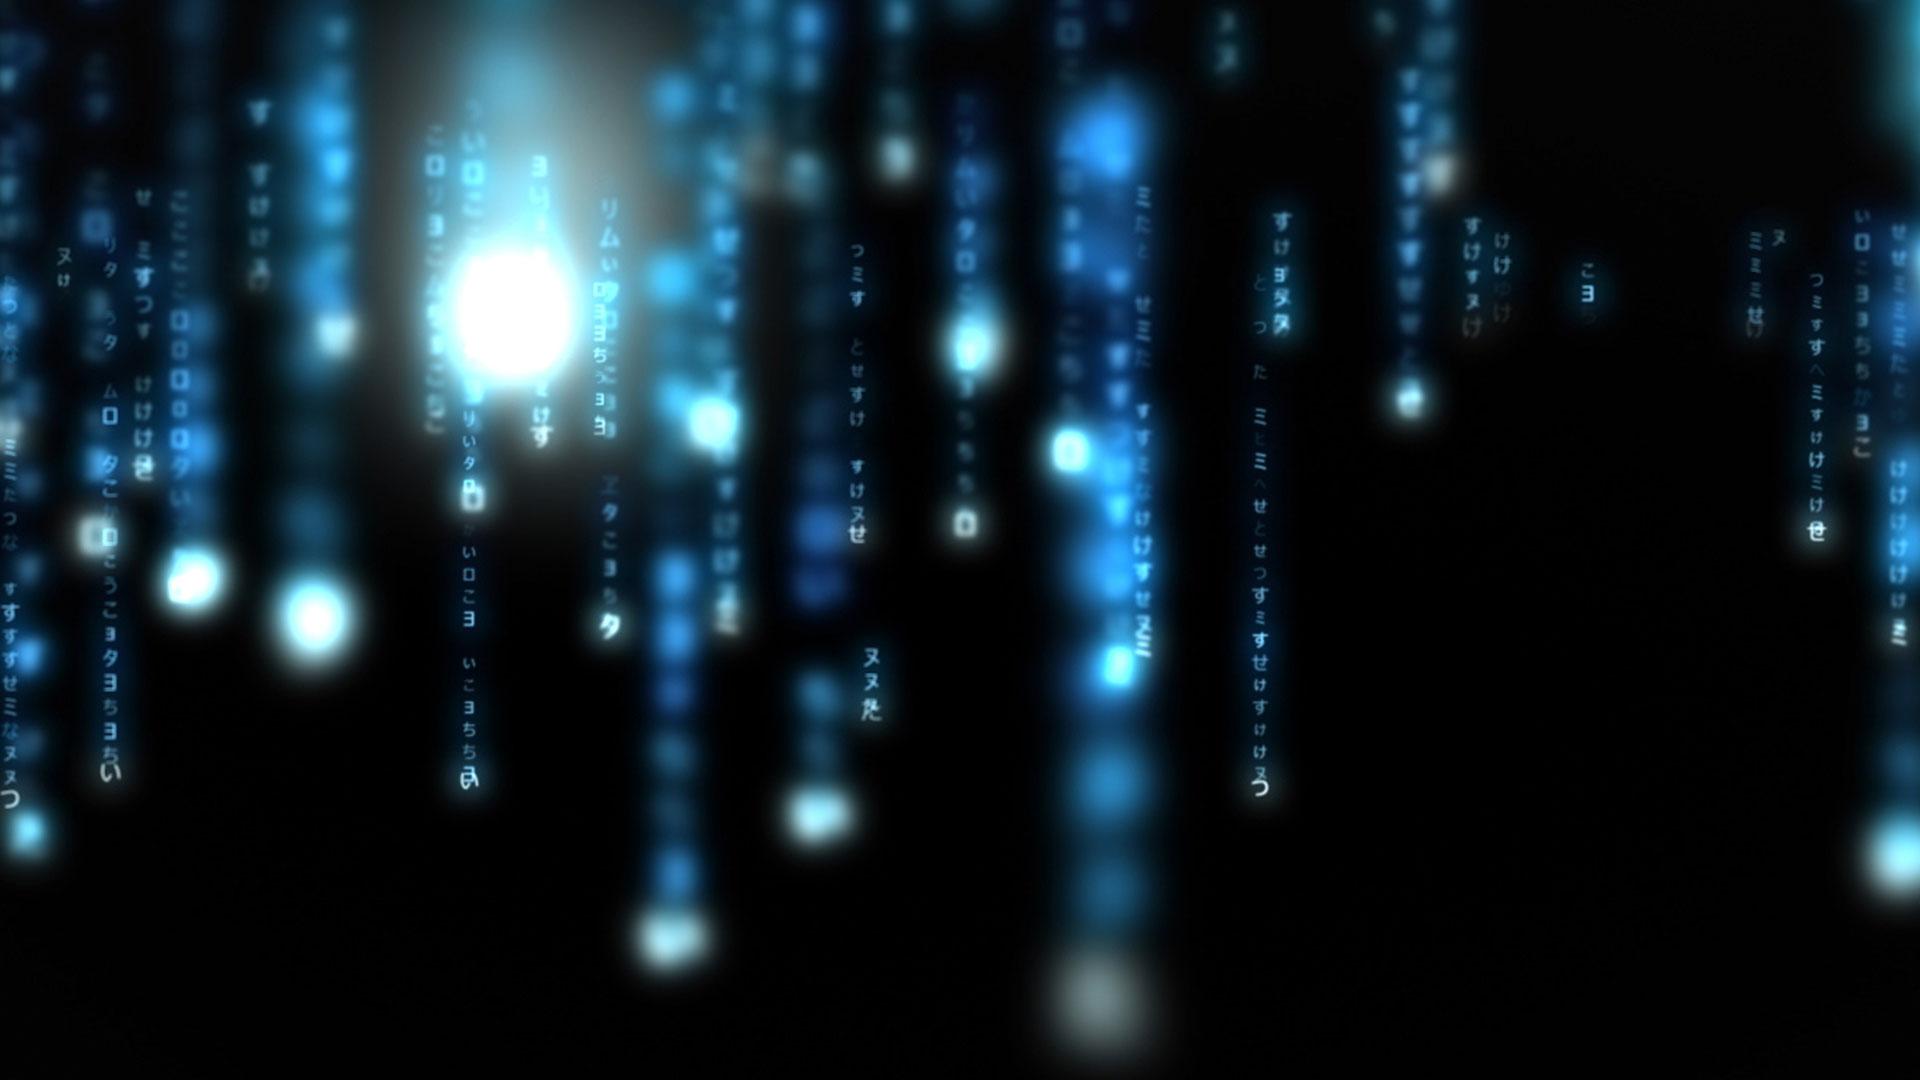 Data stream concept